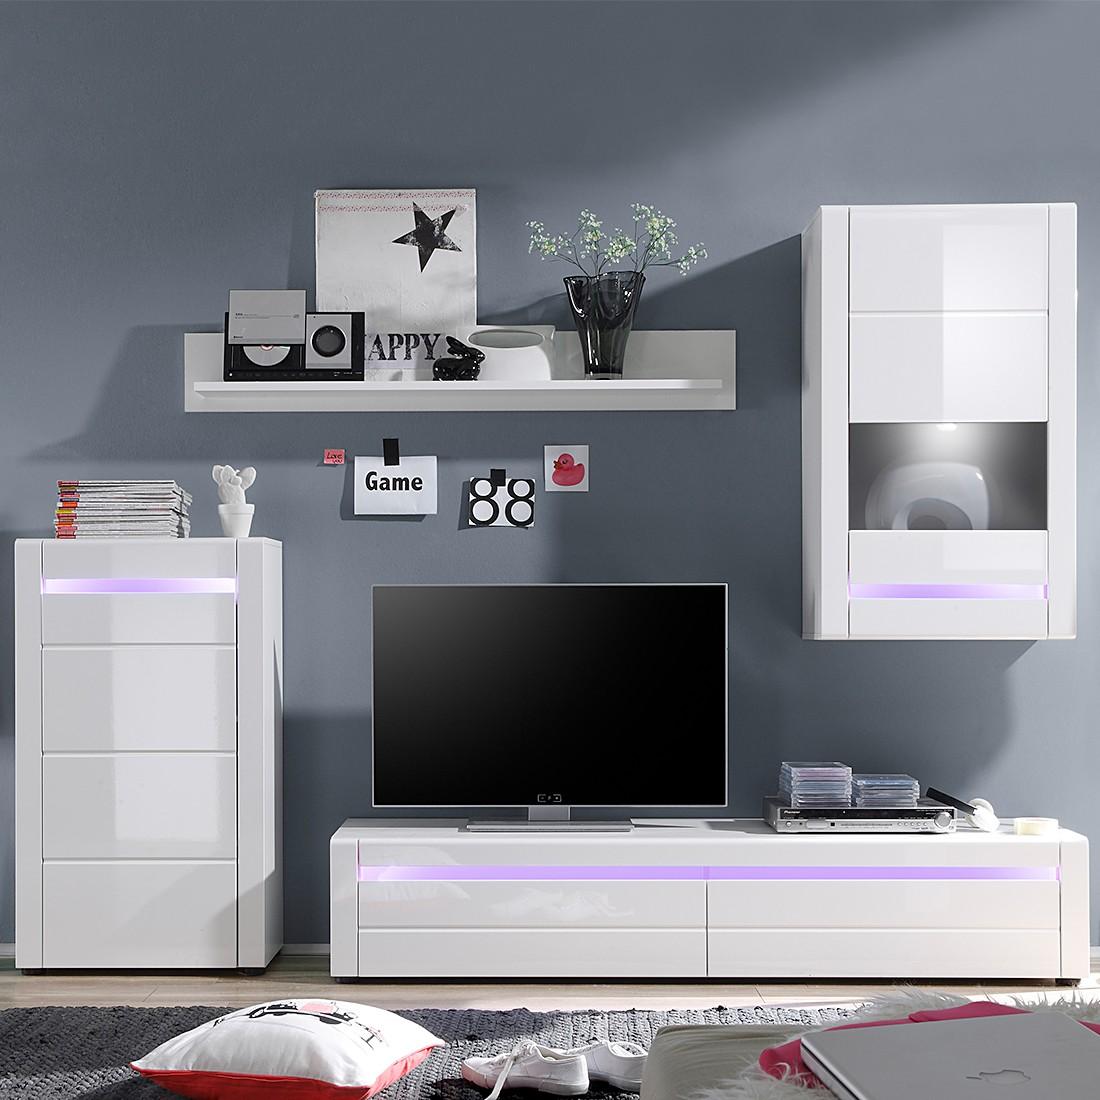 Wohnwand Meduris I (4-teilig) – inkl. Beleuchtung- Hochglanz Weiß/Weiß – Spot LED & RGB Beleuchtung, roomscape online kaufen